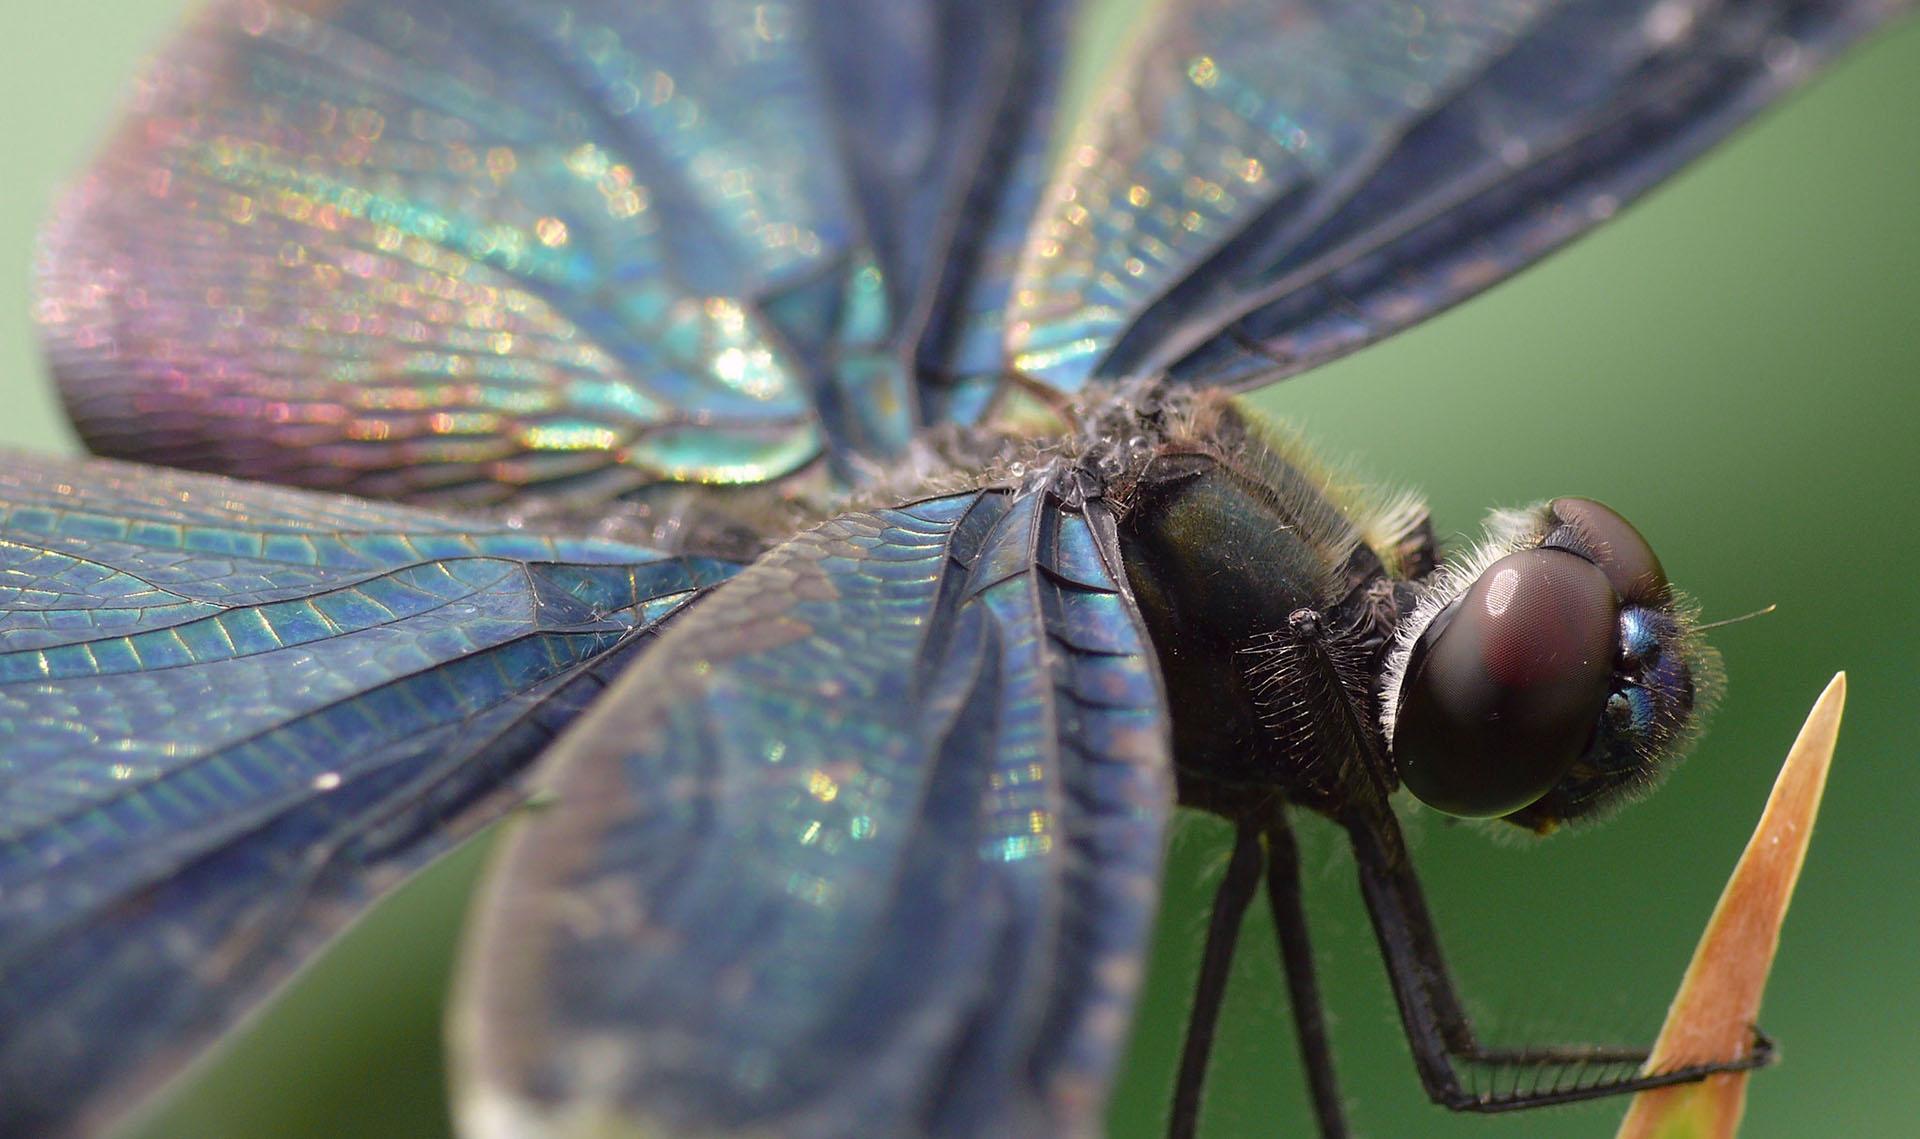 Inspirational Quotes Desktop Wallpaper Free Download Dragonfly Wallpapers Hd Pixelstalk Net